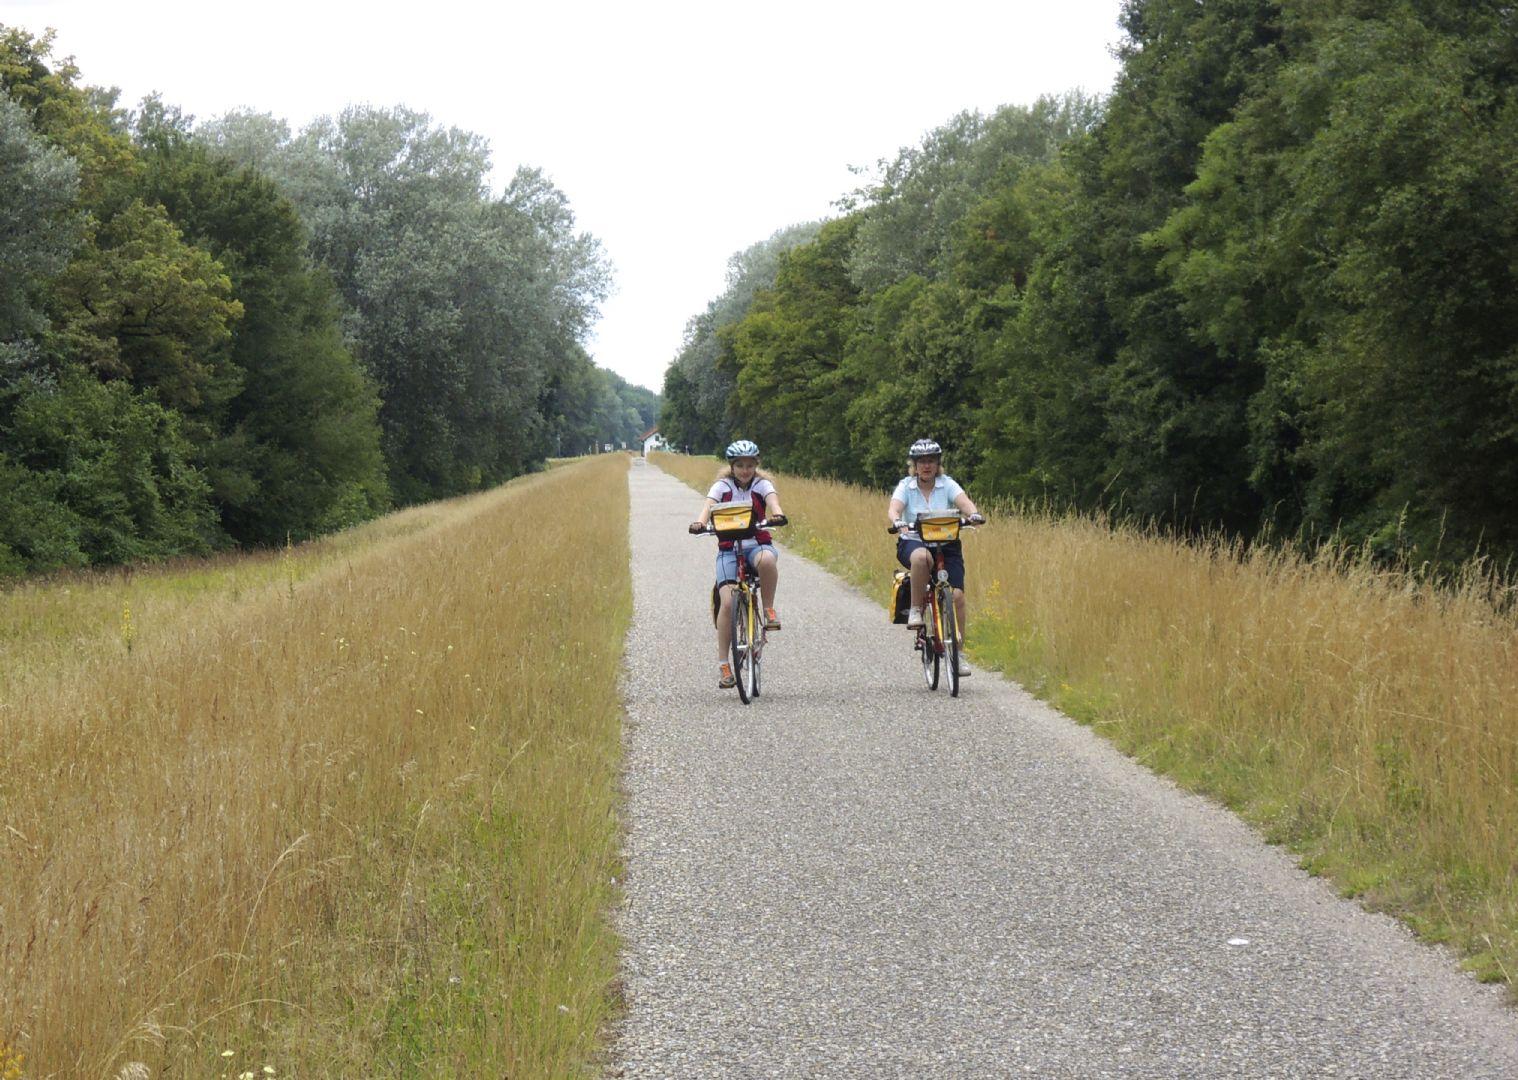 viennatobudapest4.jpg - Austria, Slovakia and Hungary - Vienna to Budapest - Self-Guided Family Cycling Holiday - Family Cycling